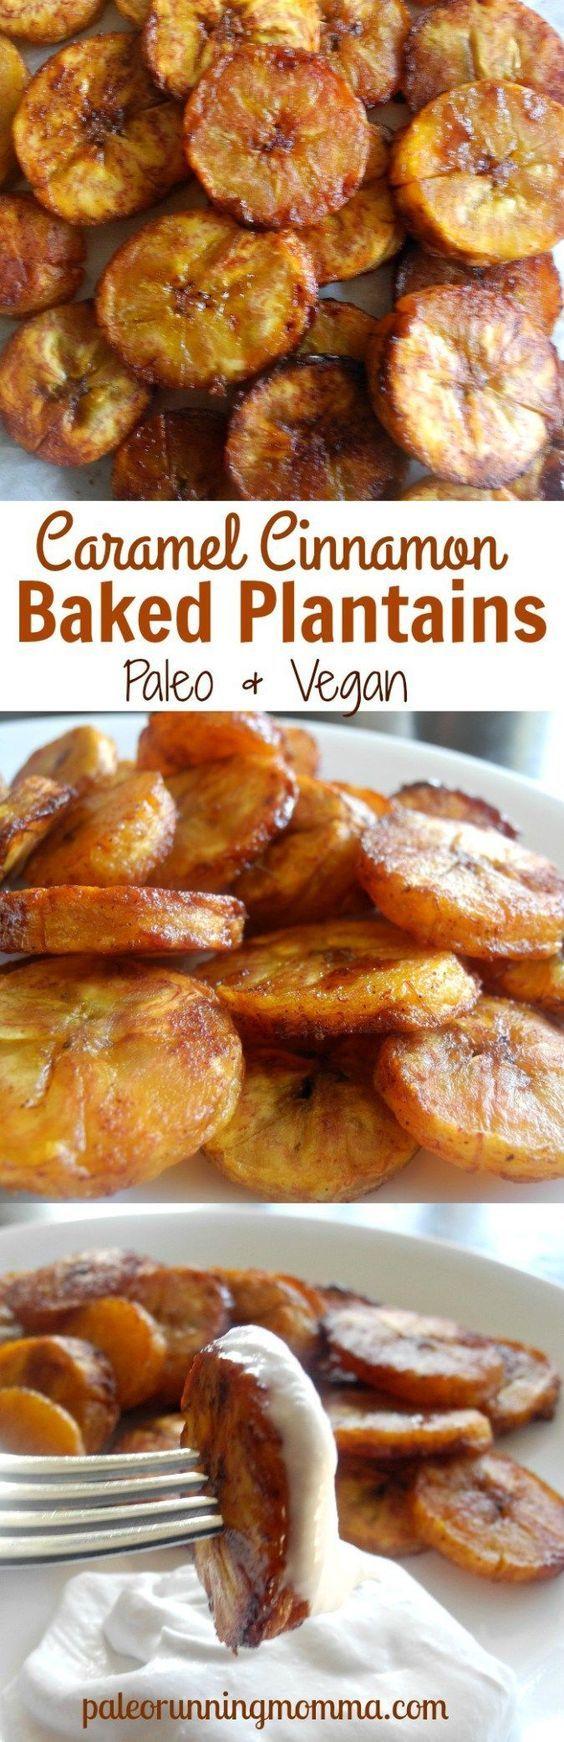 Caramel Cinnamon Baked Plantains #paleo #vegan #grainfree @paleorunmomma